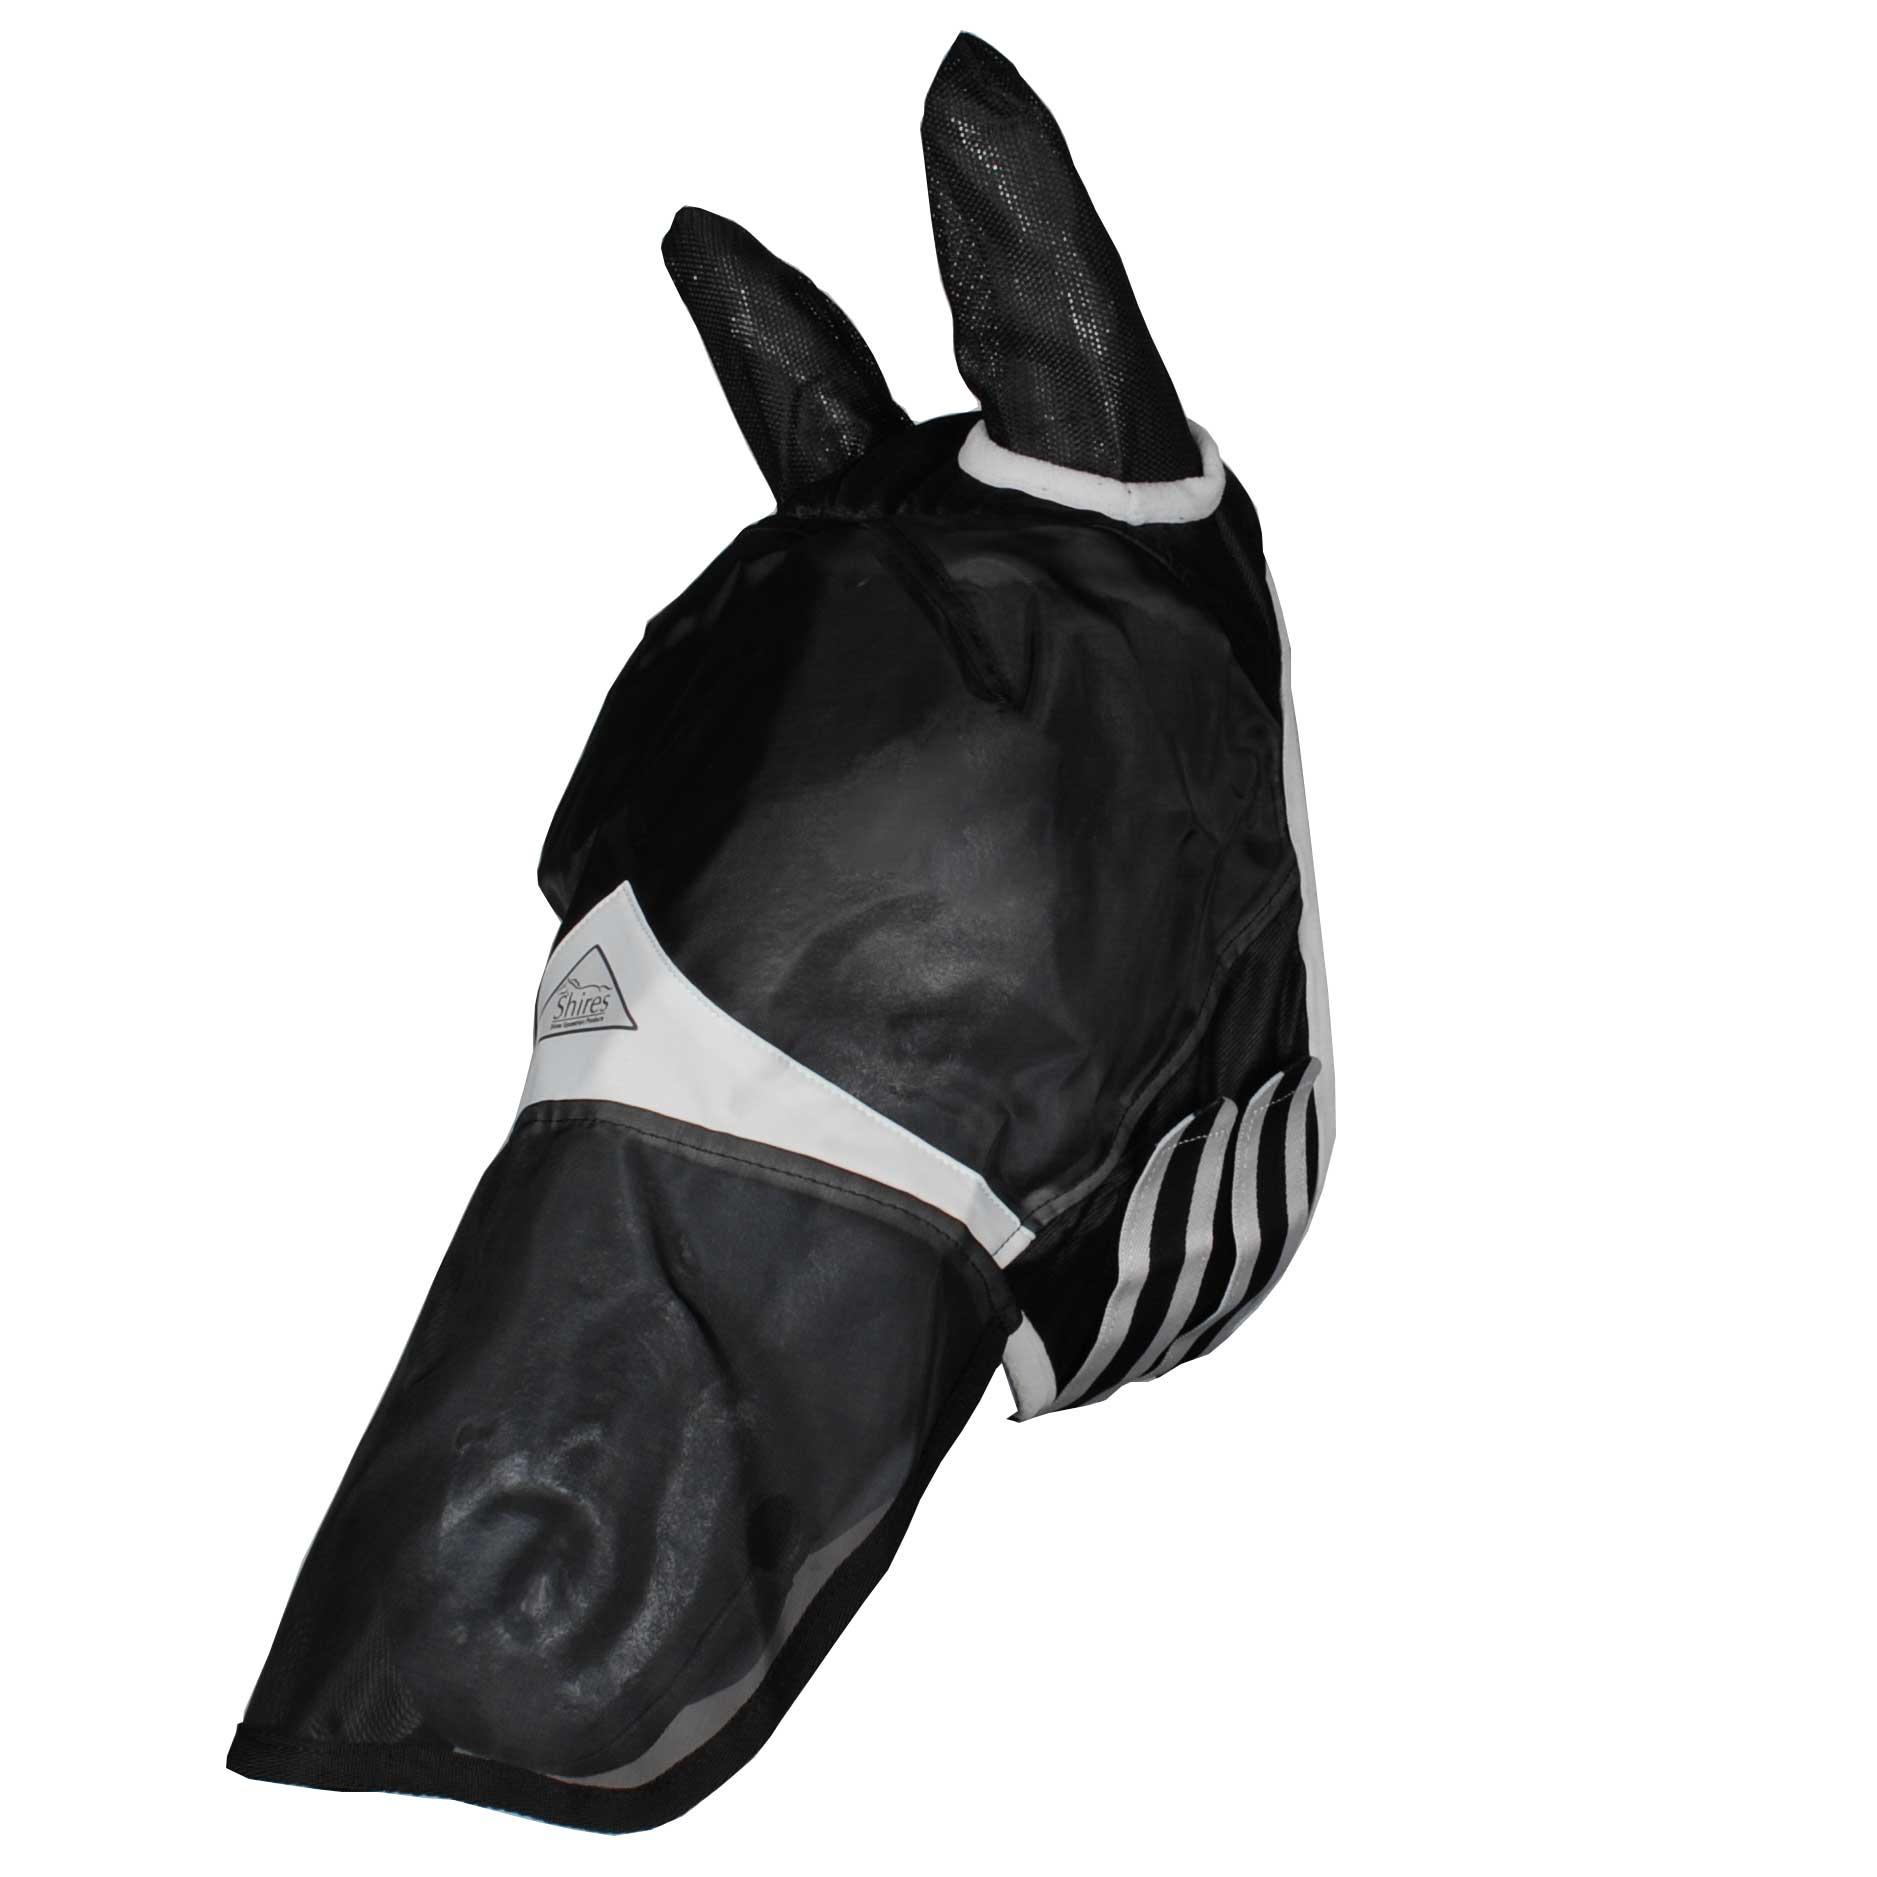 Shires Fine vliegenmasker